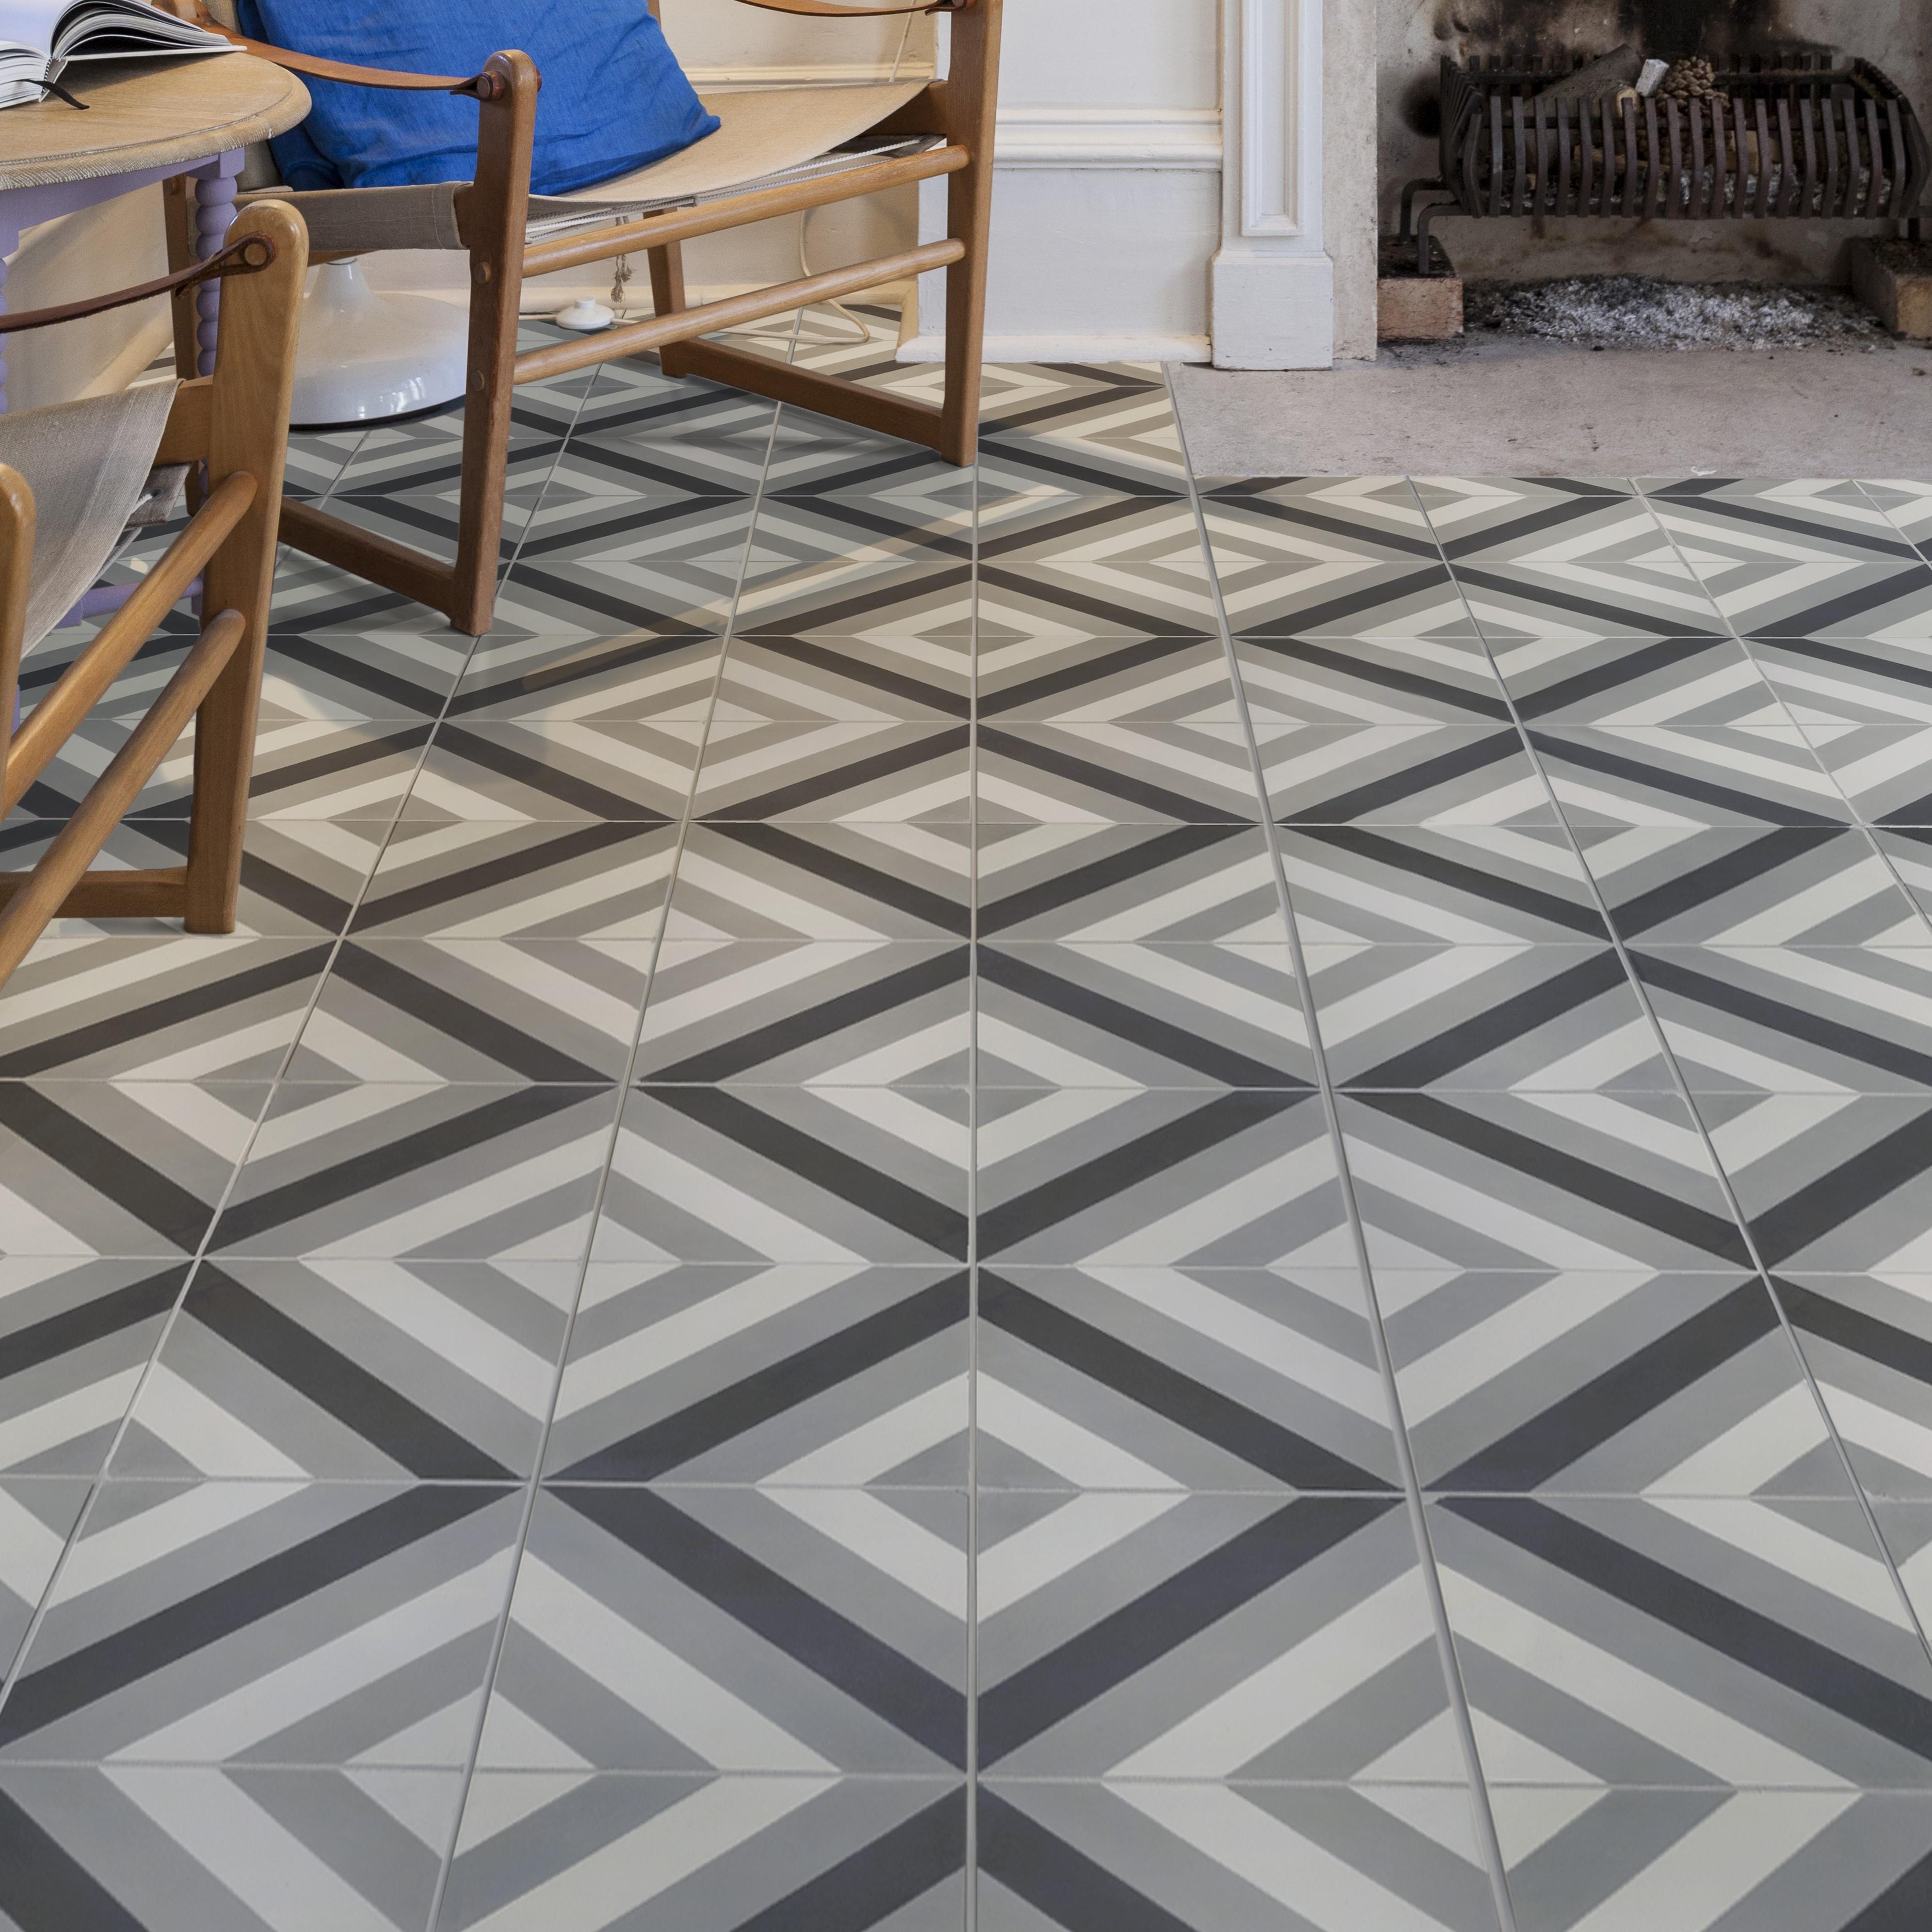 Modern Encaustic Cement Floors Edinburgh Tile Studio